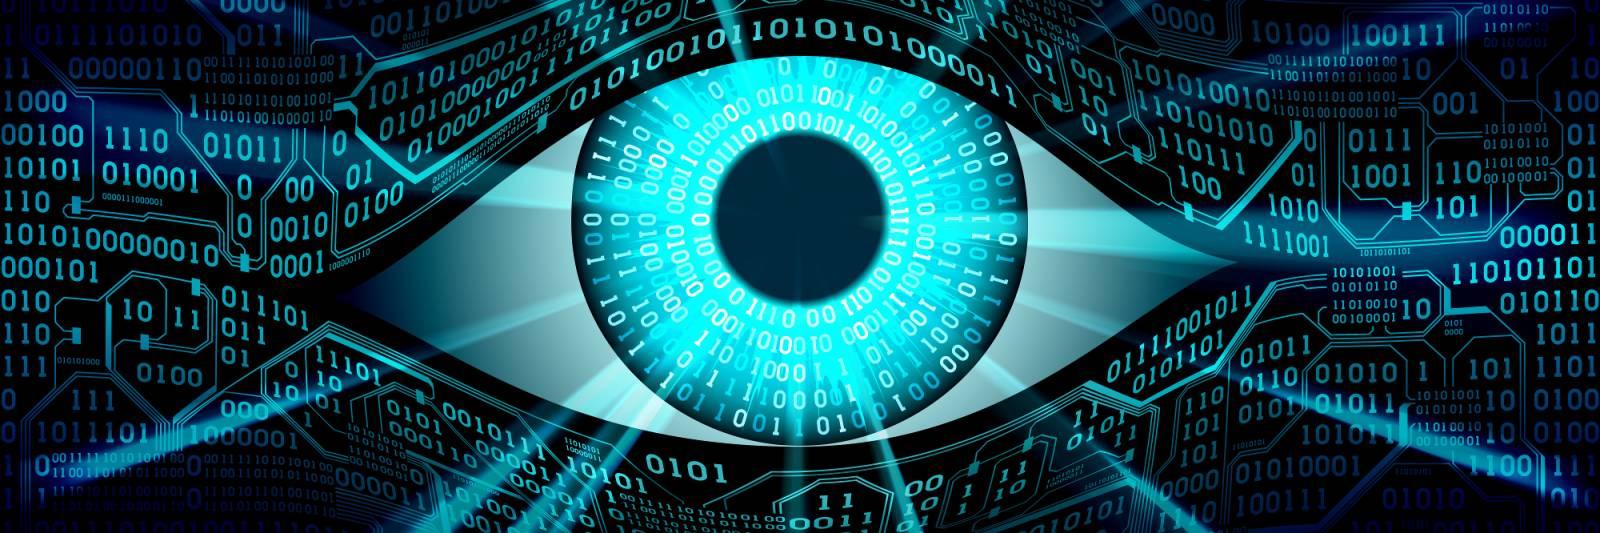 senators introduce a new bill to protect consumer data privacy